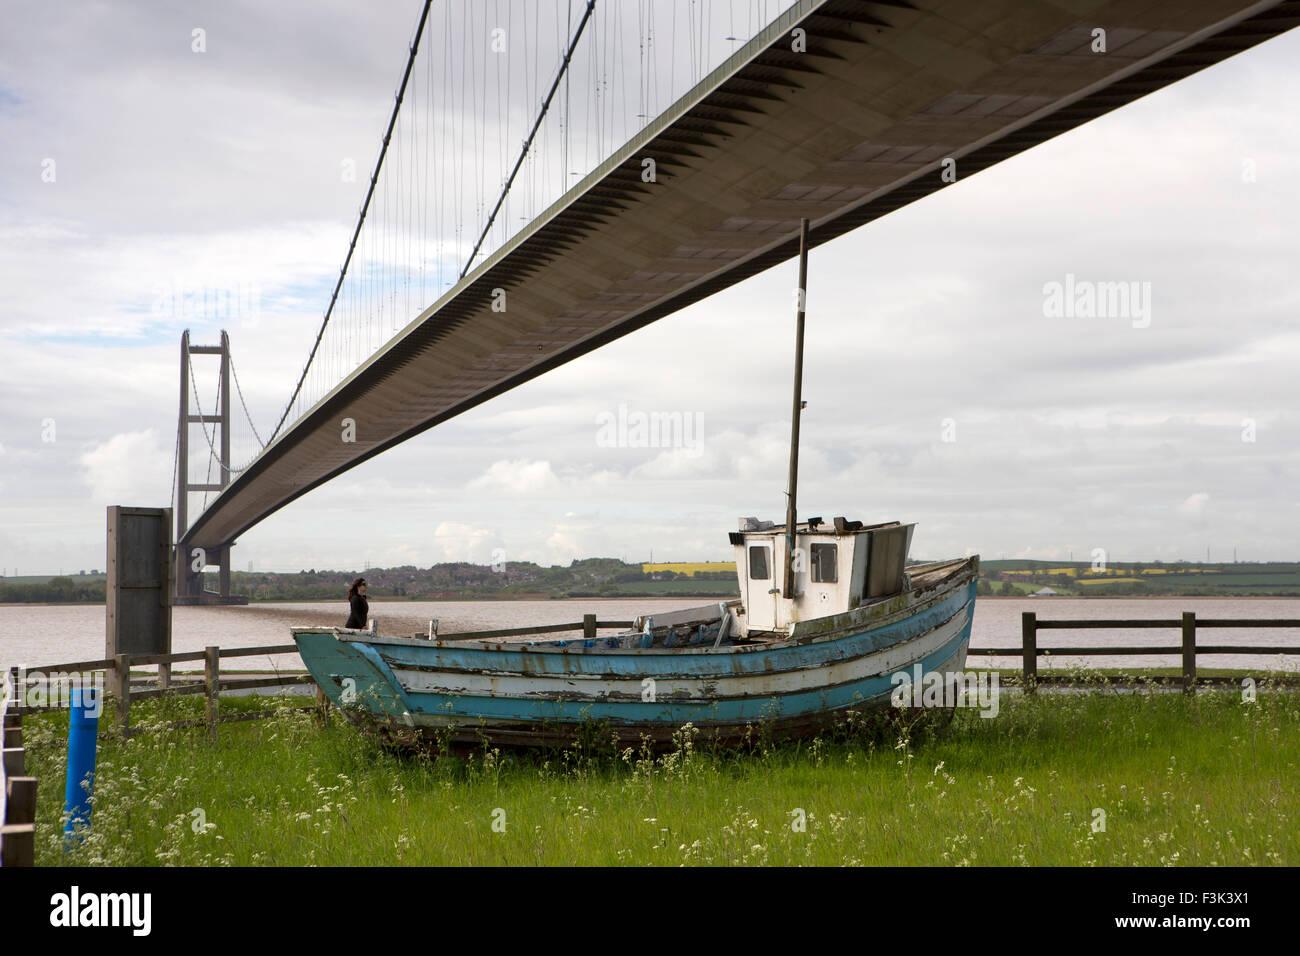 Großbritannien, England, Yorkshire East Riding, Hessle, altes Fischerboot unter Humber Hängebrücke Stockbild